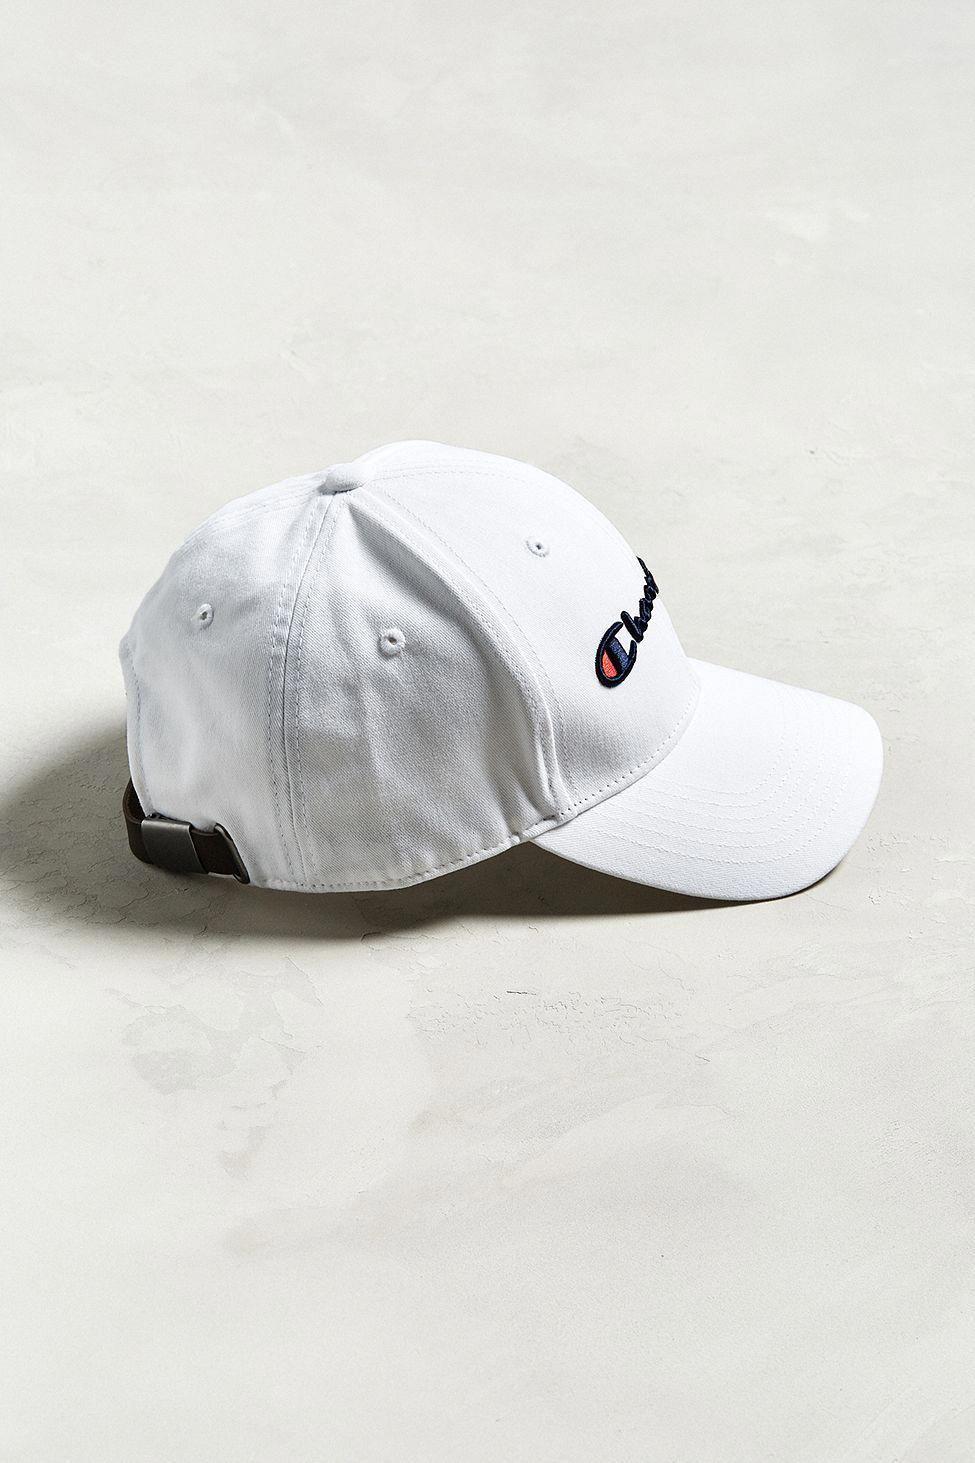 66252fc6cc2 Urban Outfitters Champion Classic Twill Baseball Hat - White One Size   baseballhats